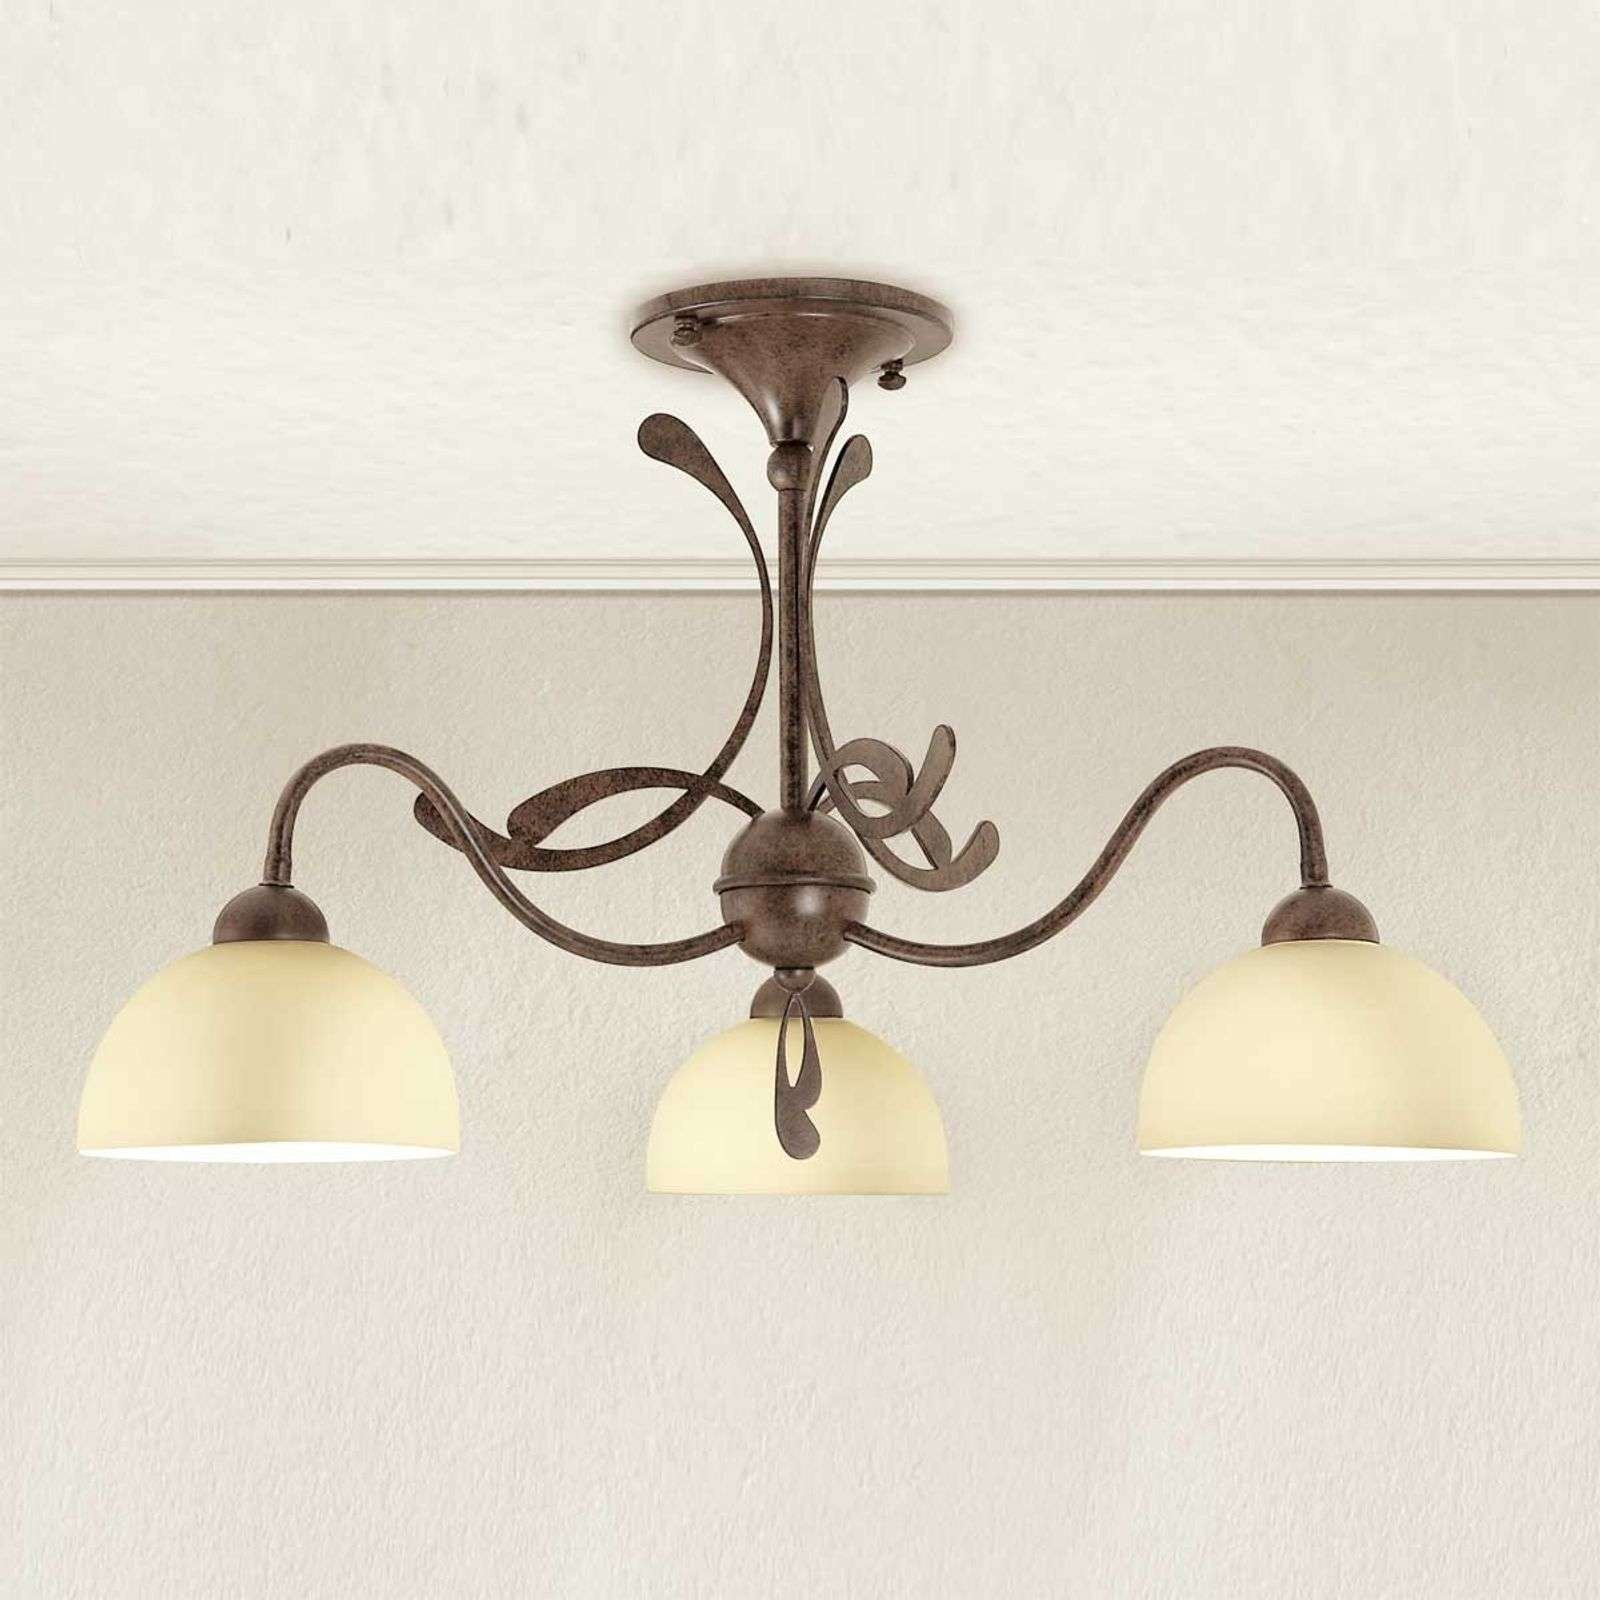 Multi bulb ceiling light Lorenzo